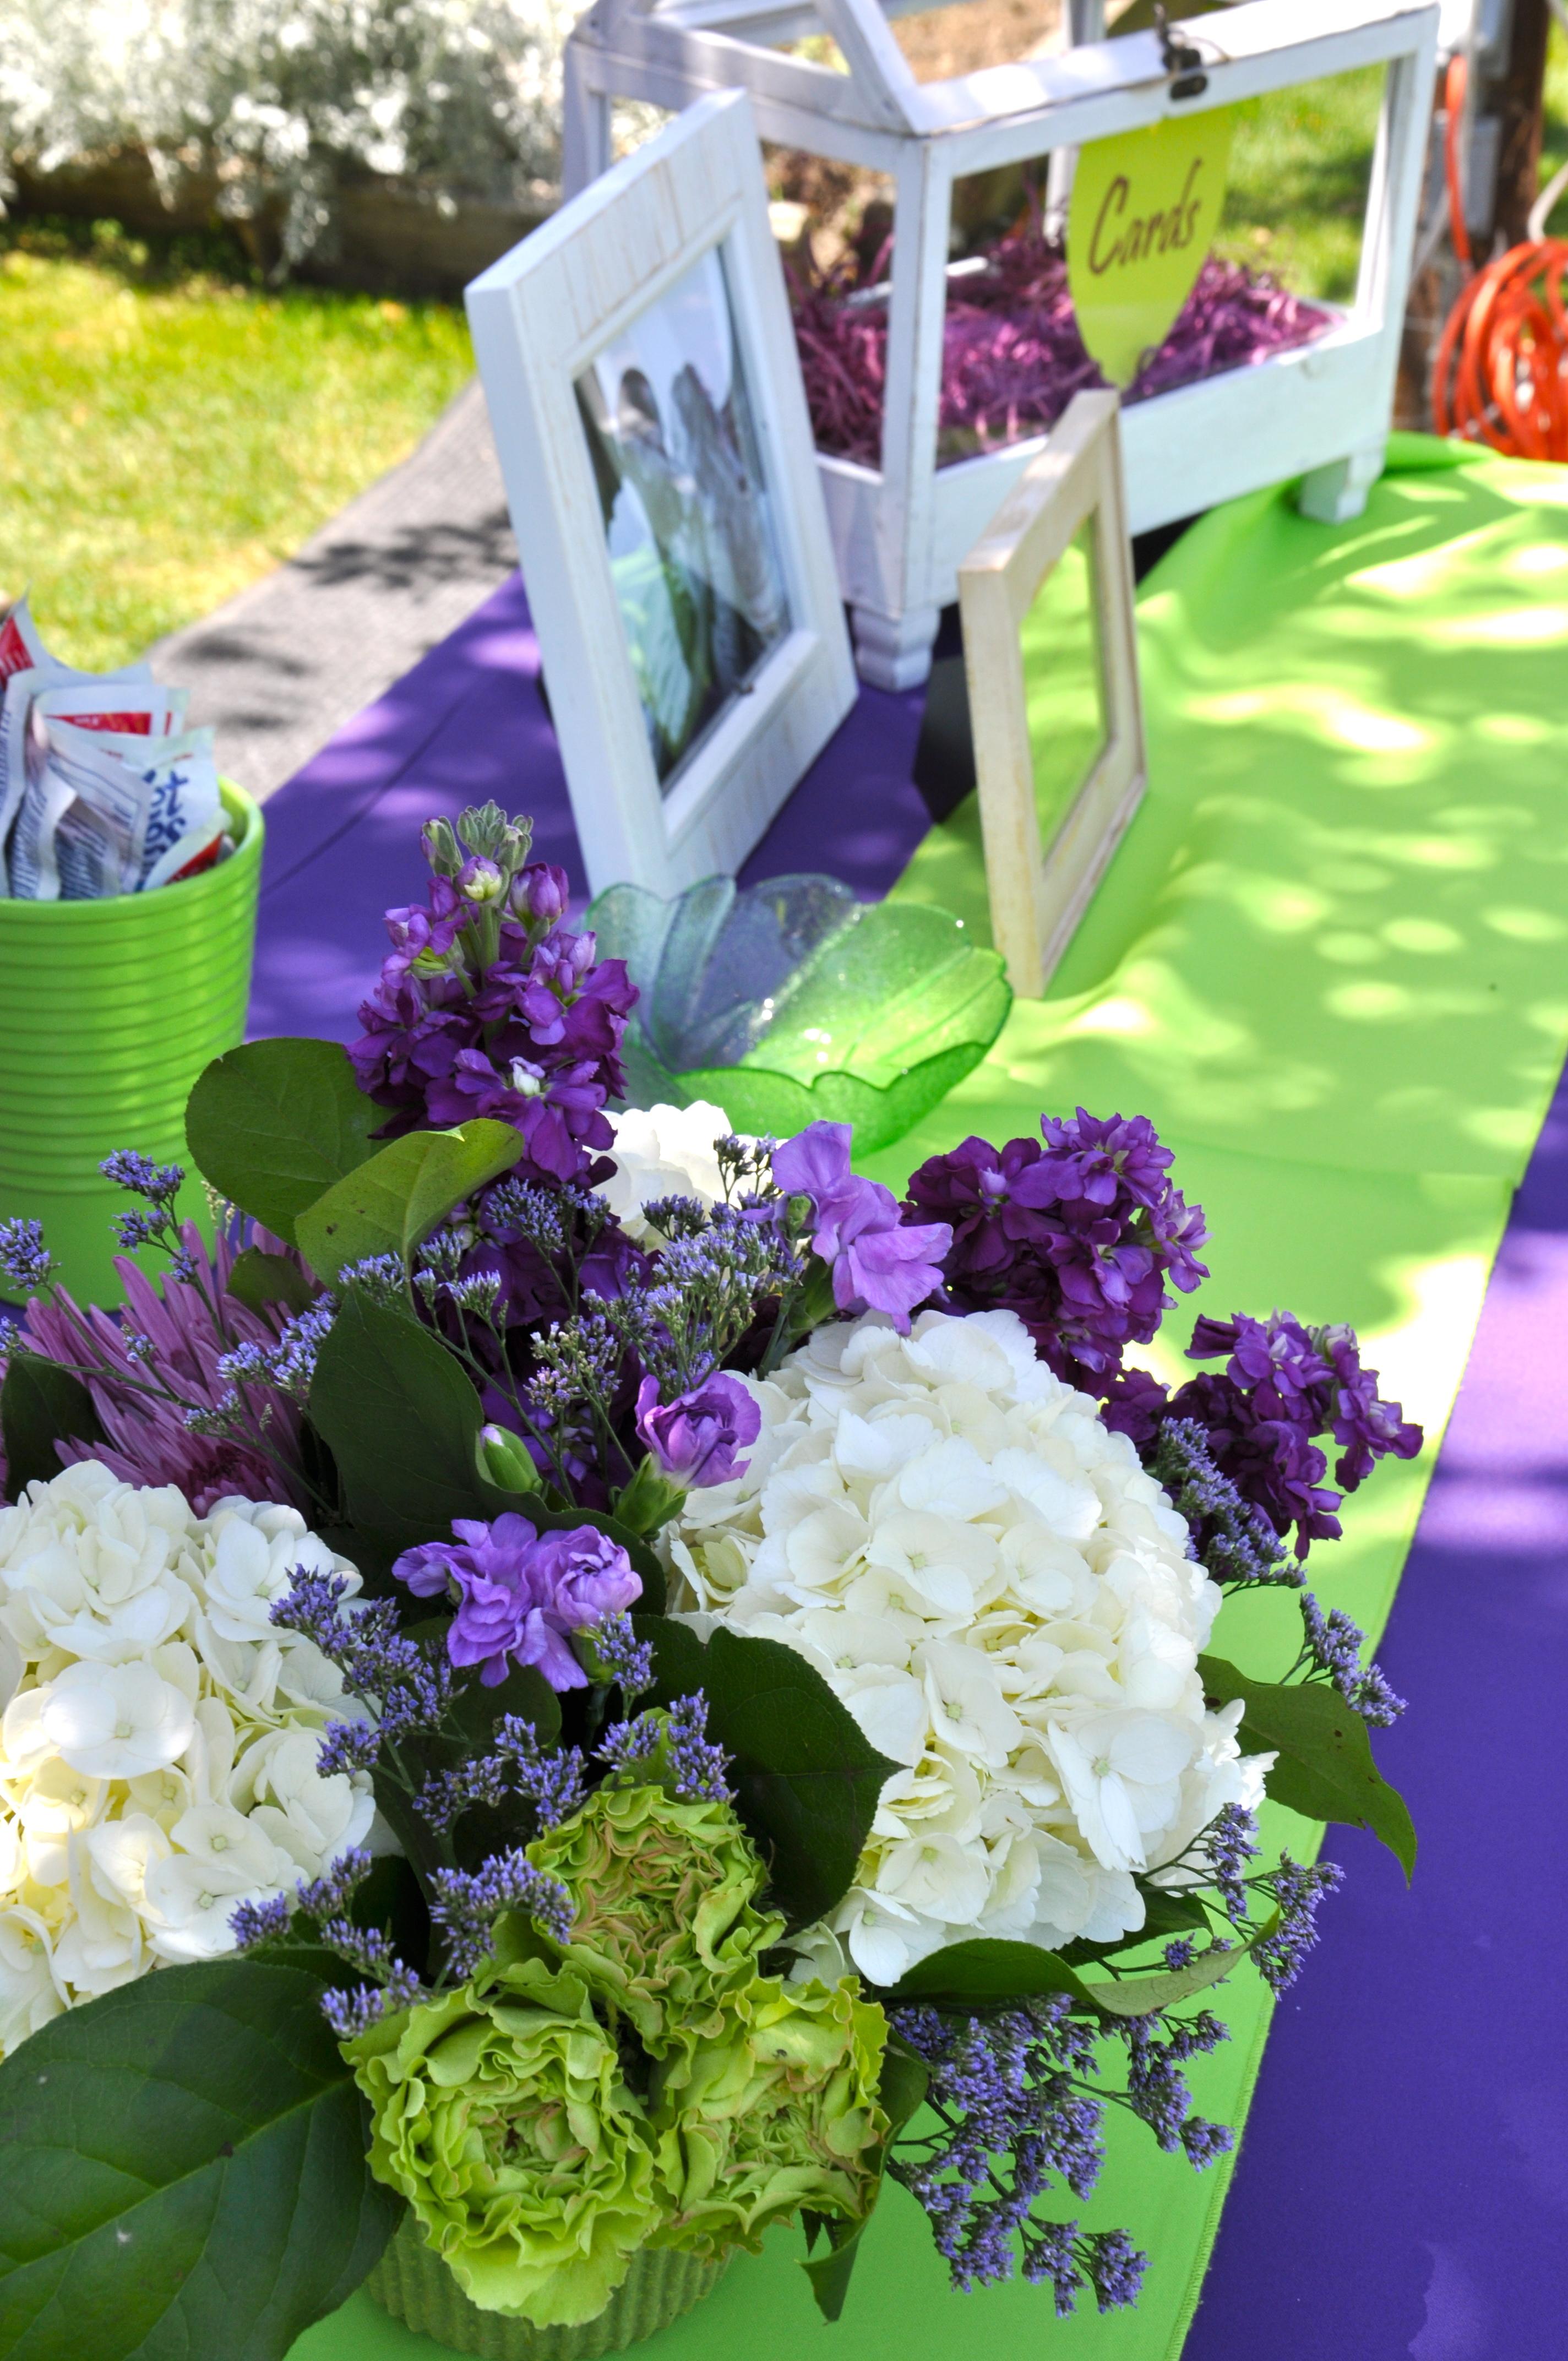 Stunning Green And Purple Wedding Ideas Images - Styles & Ideas 2018 ...